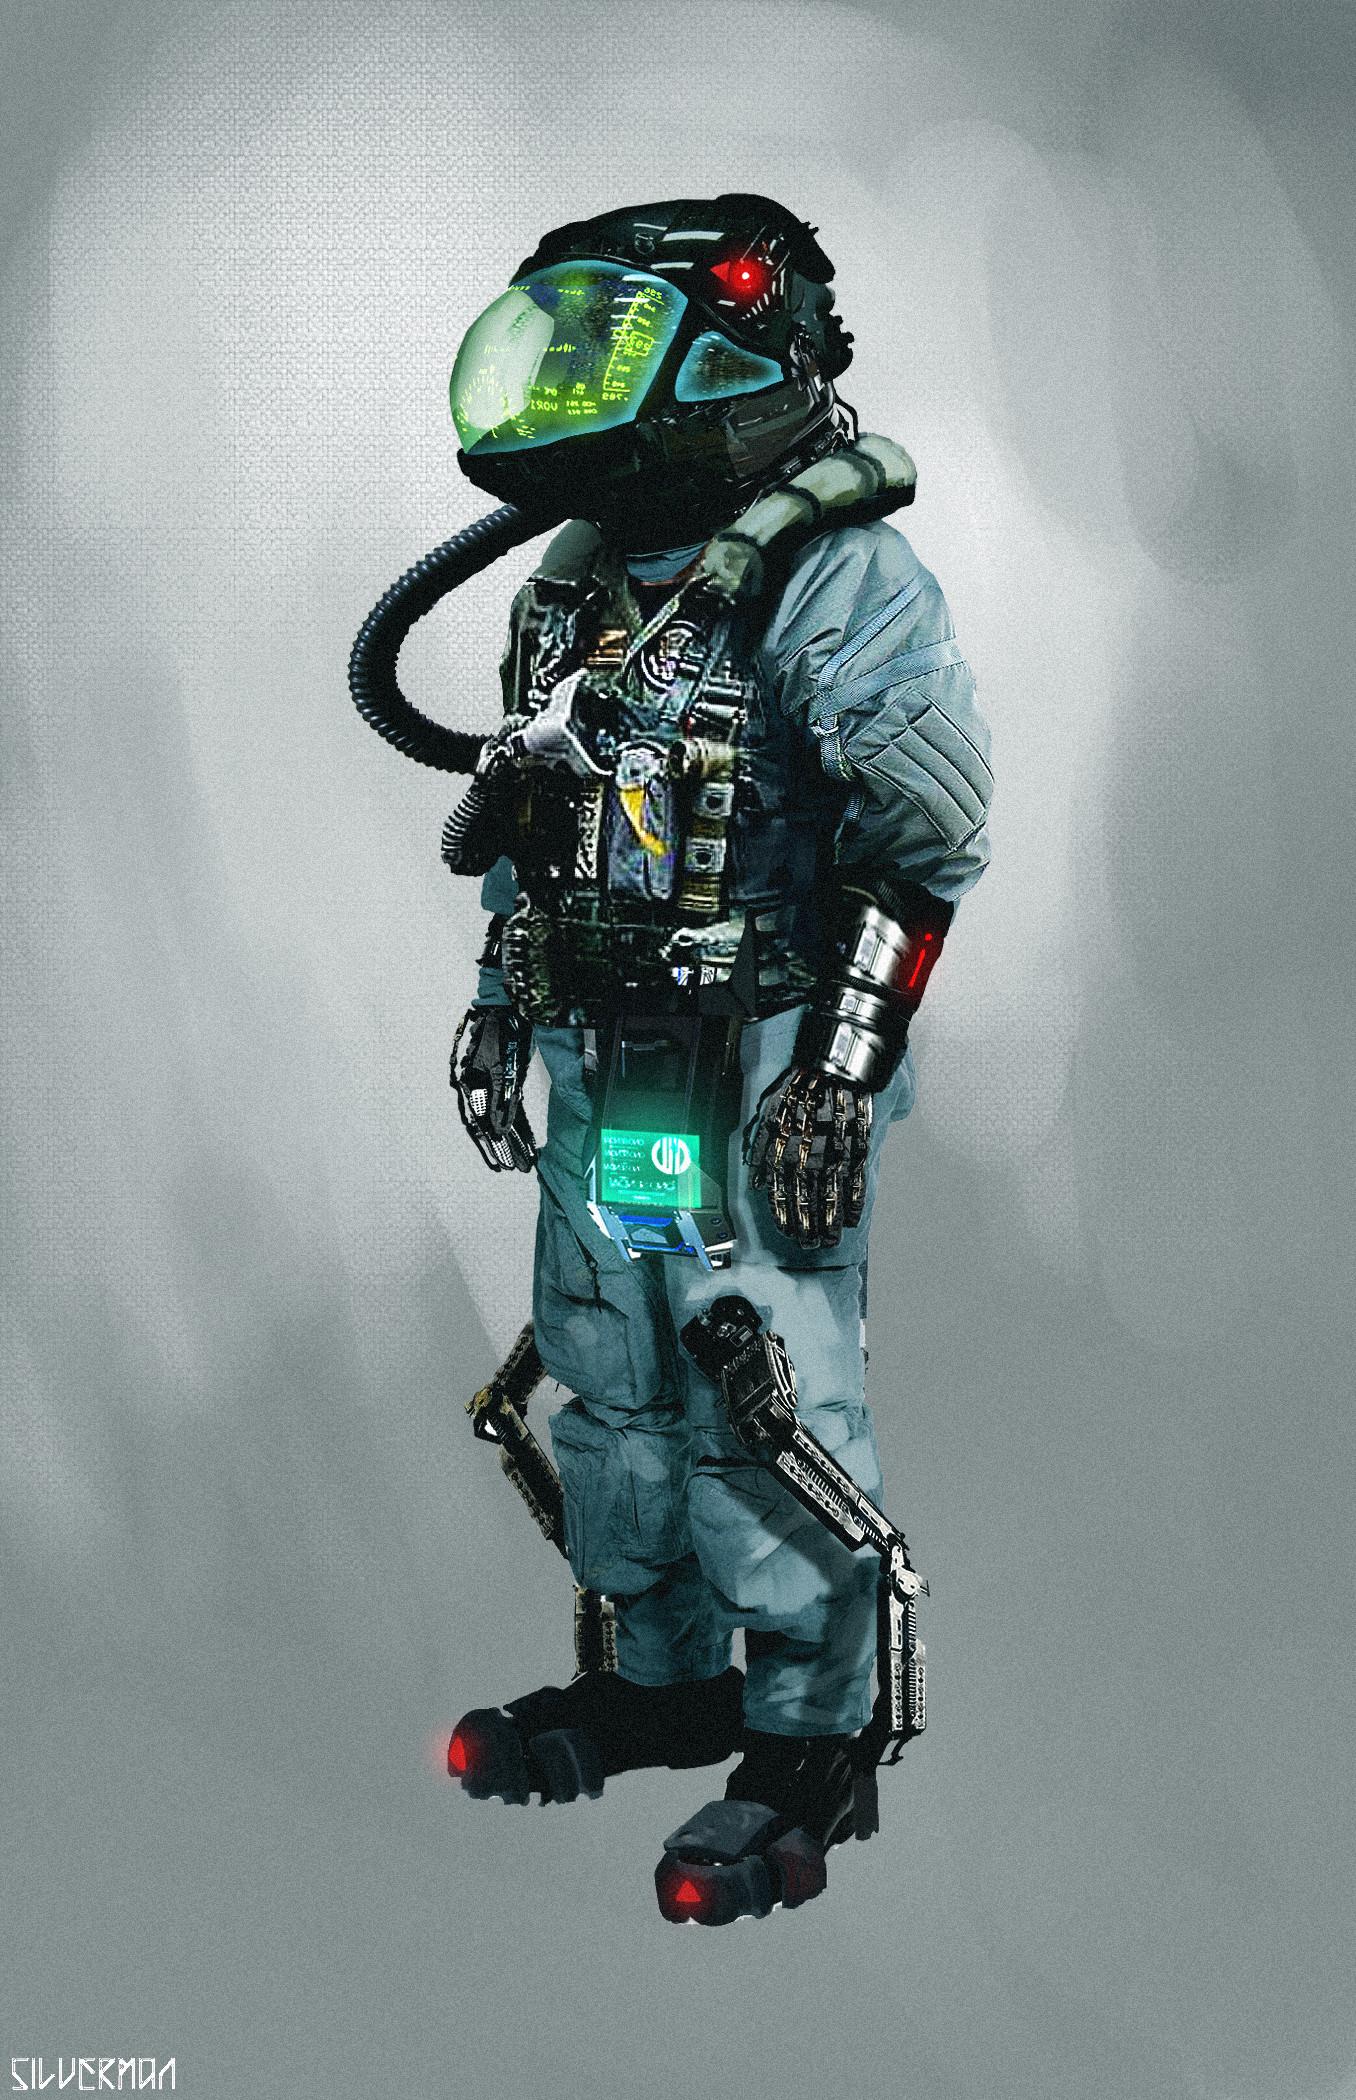 Samuel silverman space pilot